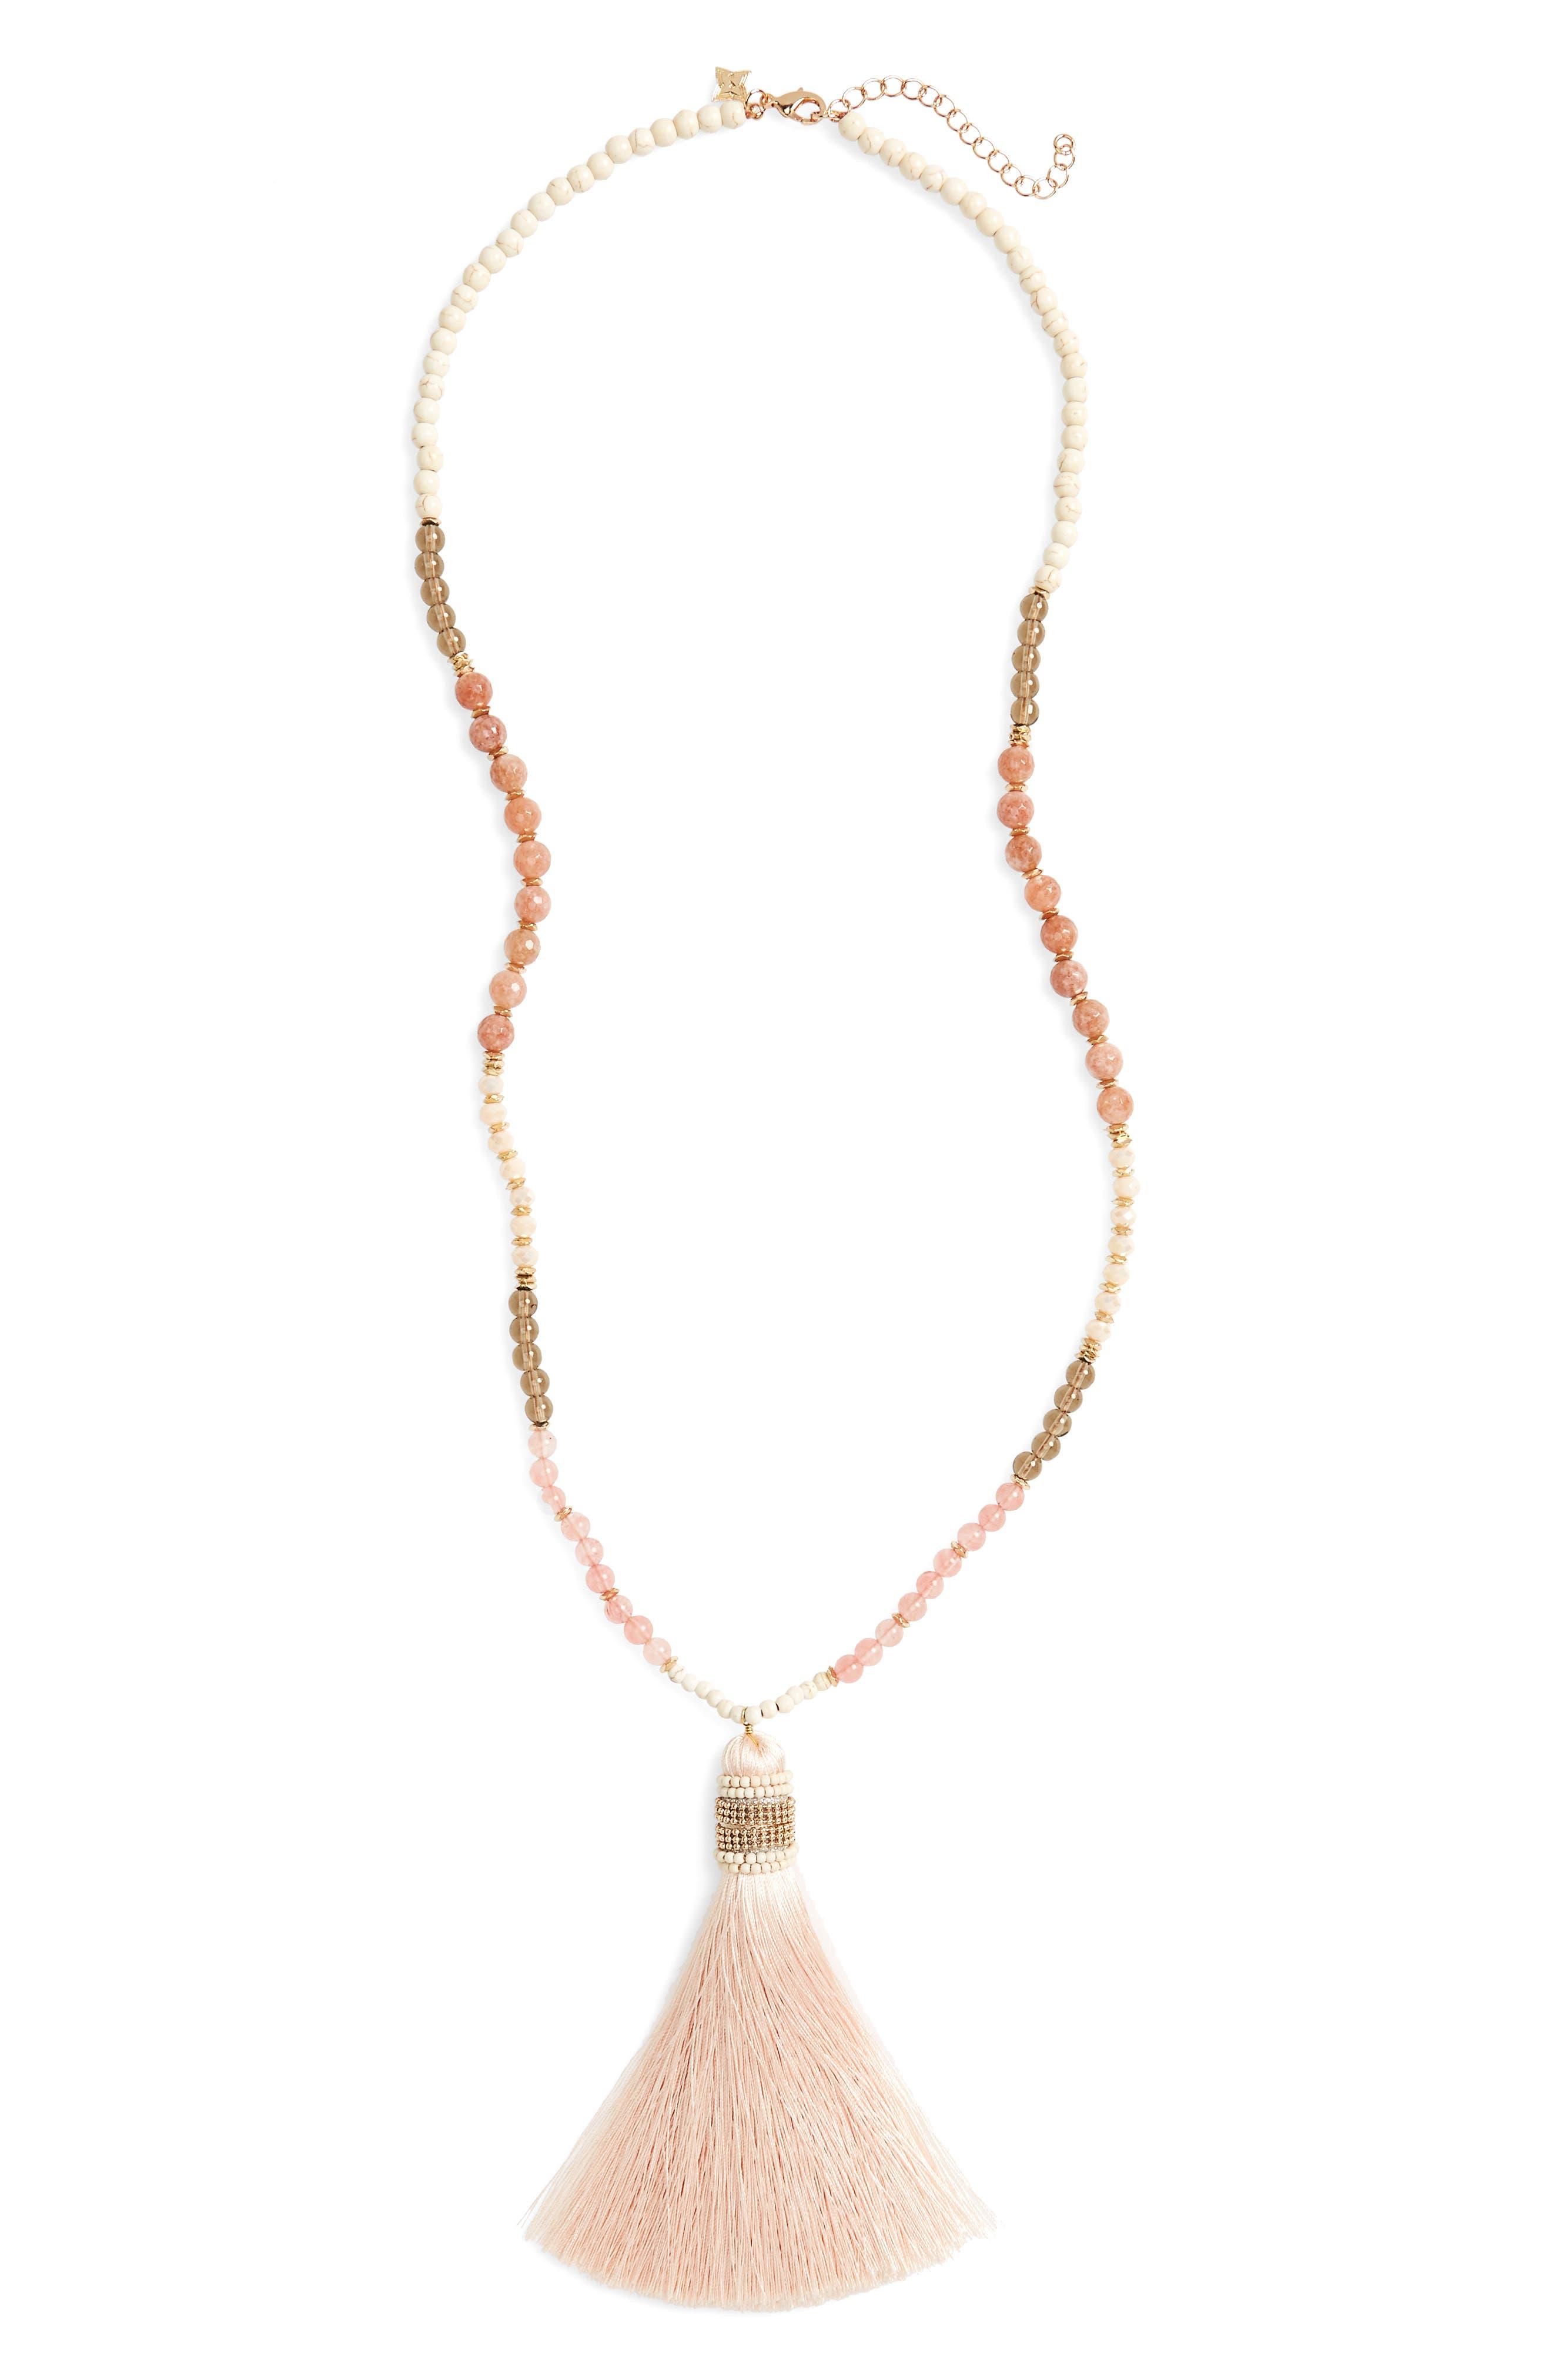 Stone Tassel Necklace,                             Main thumbnail 1, color,                             100